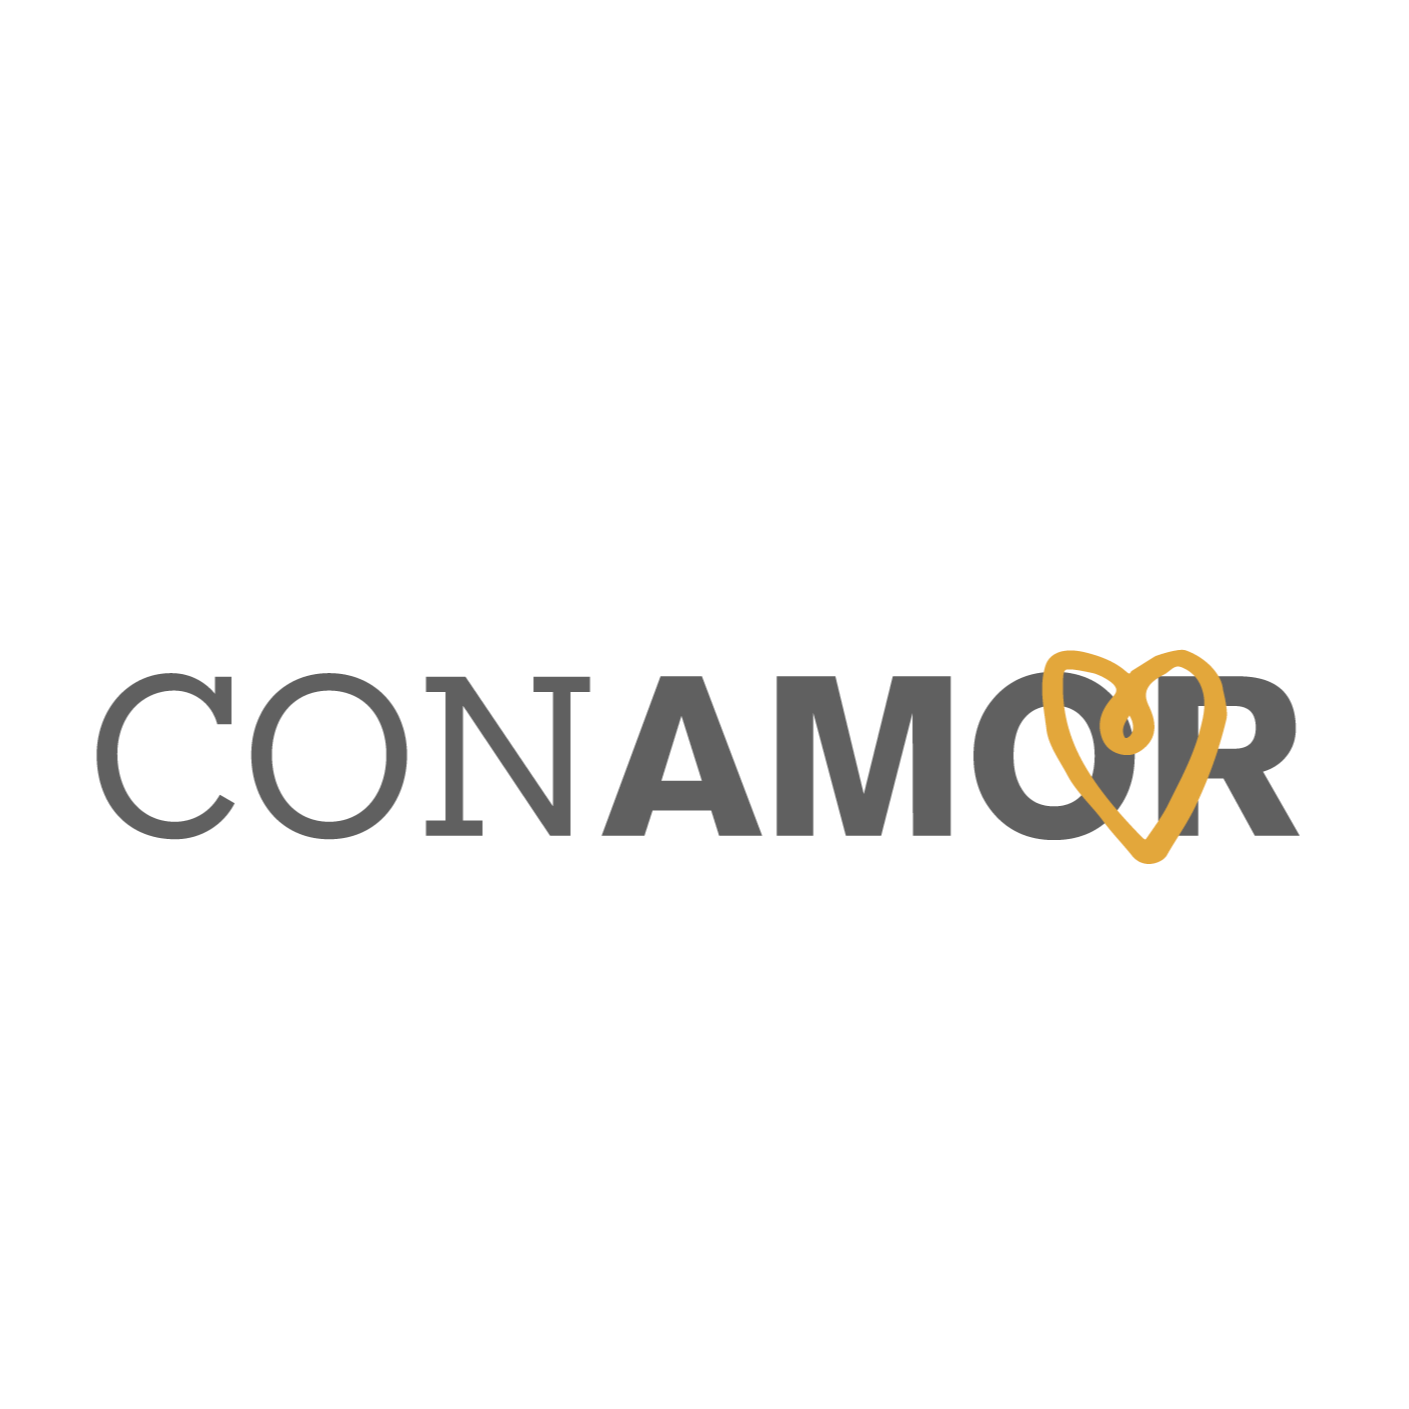 @conamorar Profile Image | Linktree